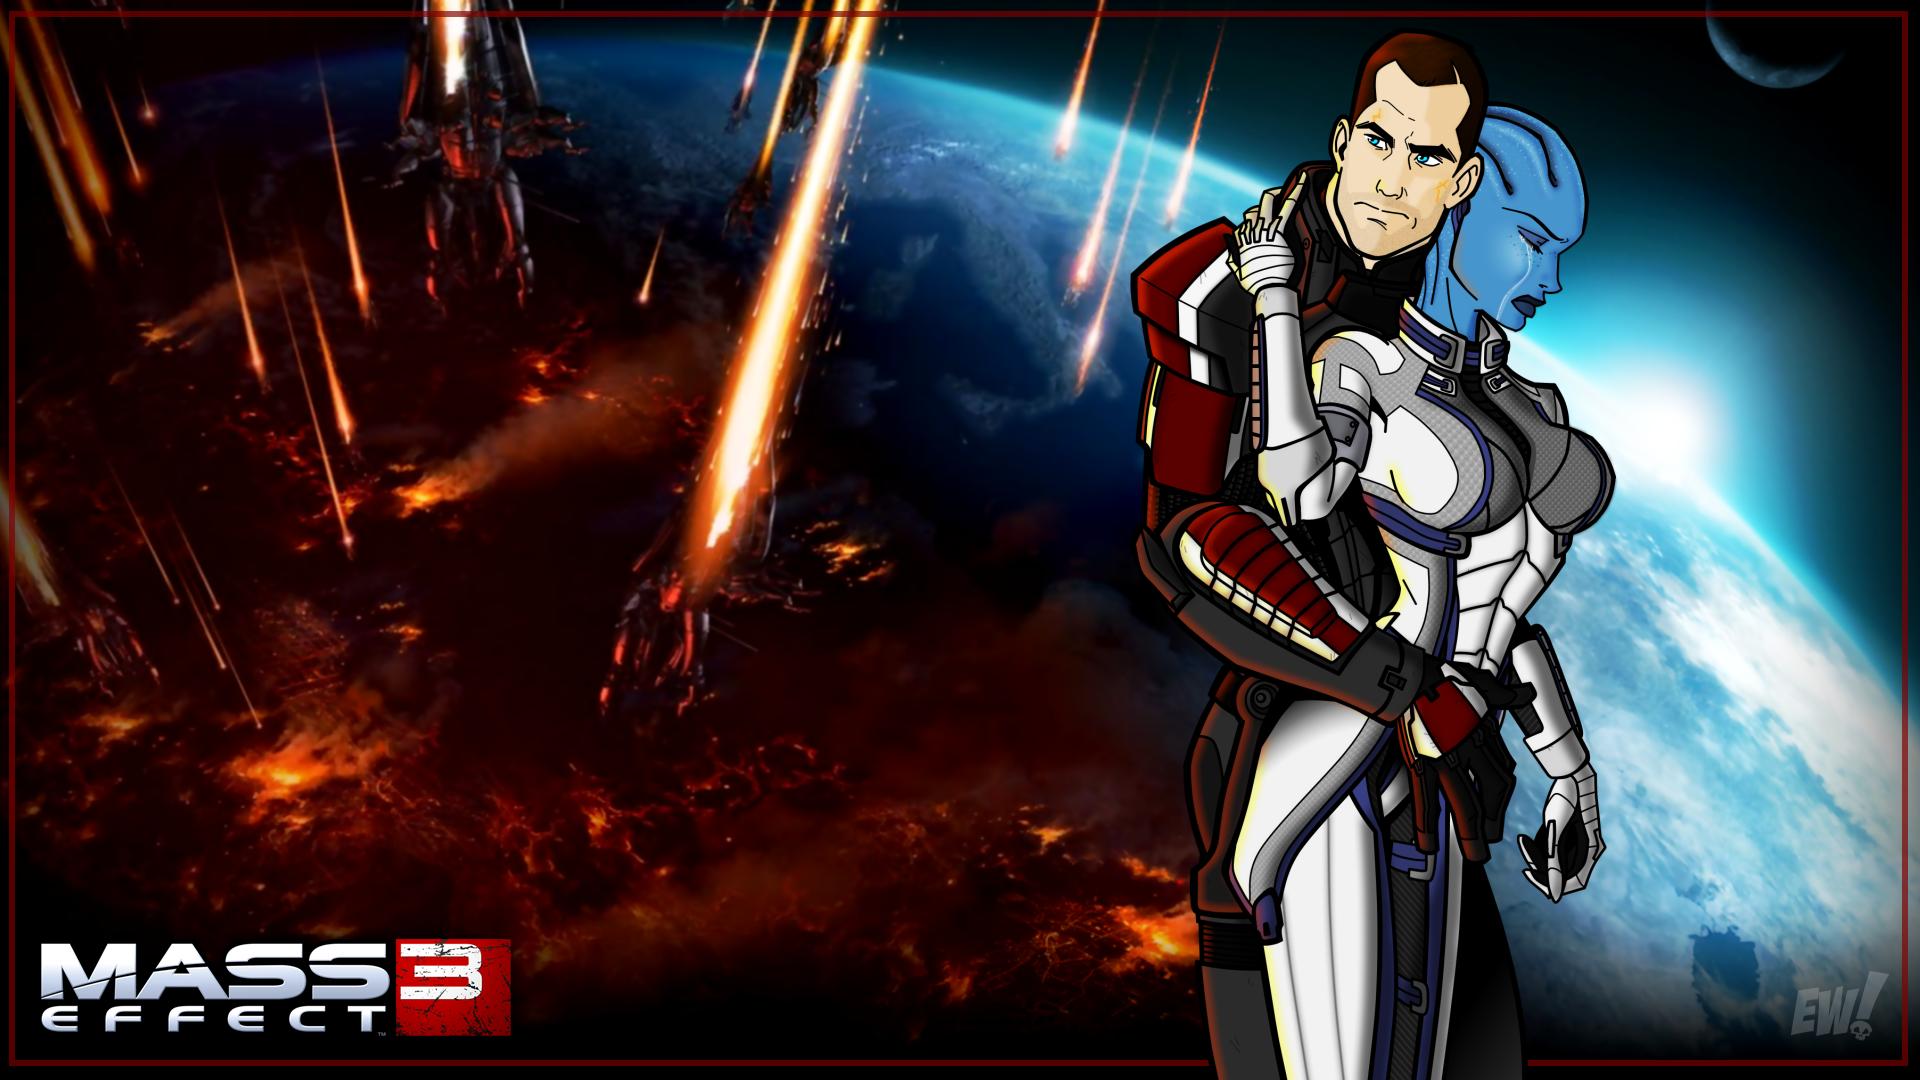 Mass Effect 3 Wallpaper: Mass Effect 3 HD Wallpaper